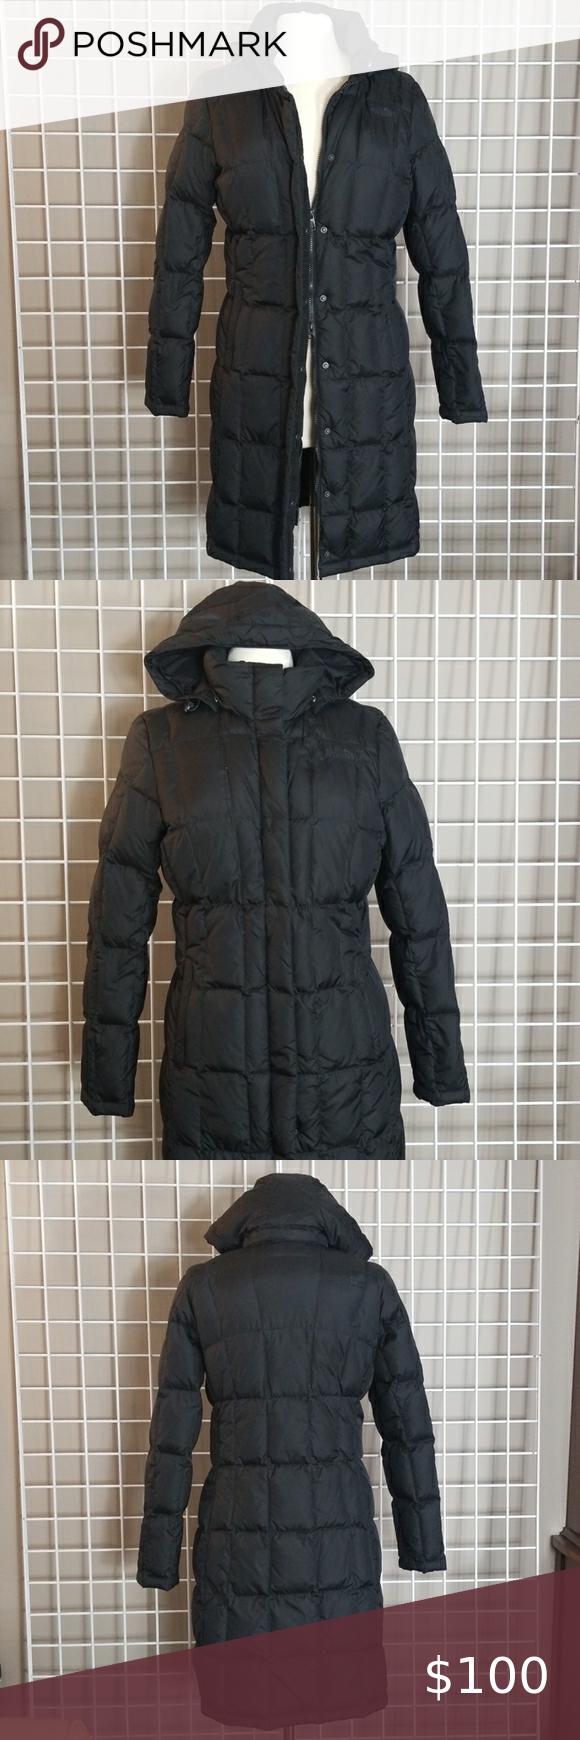 Womens Long North Face Coat W Detatchable Hood M North Face Long Coat North Face Coat North Face Jacket [ 1740 x 580 Pixel ]